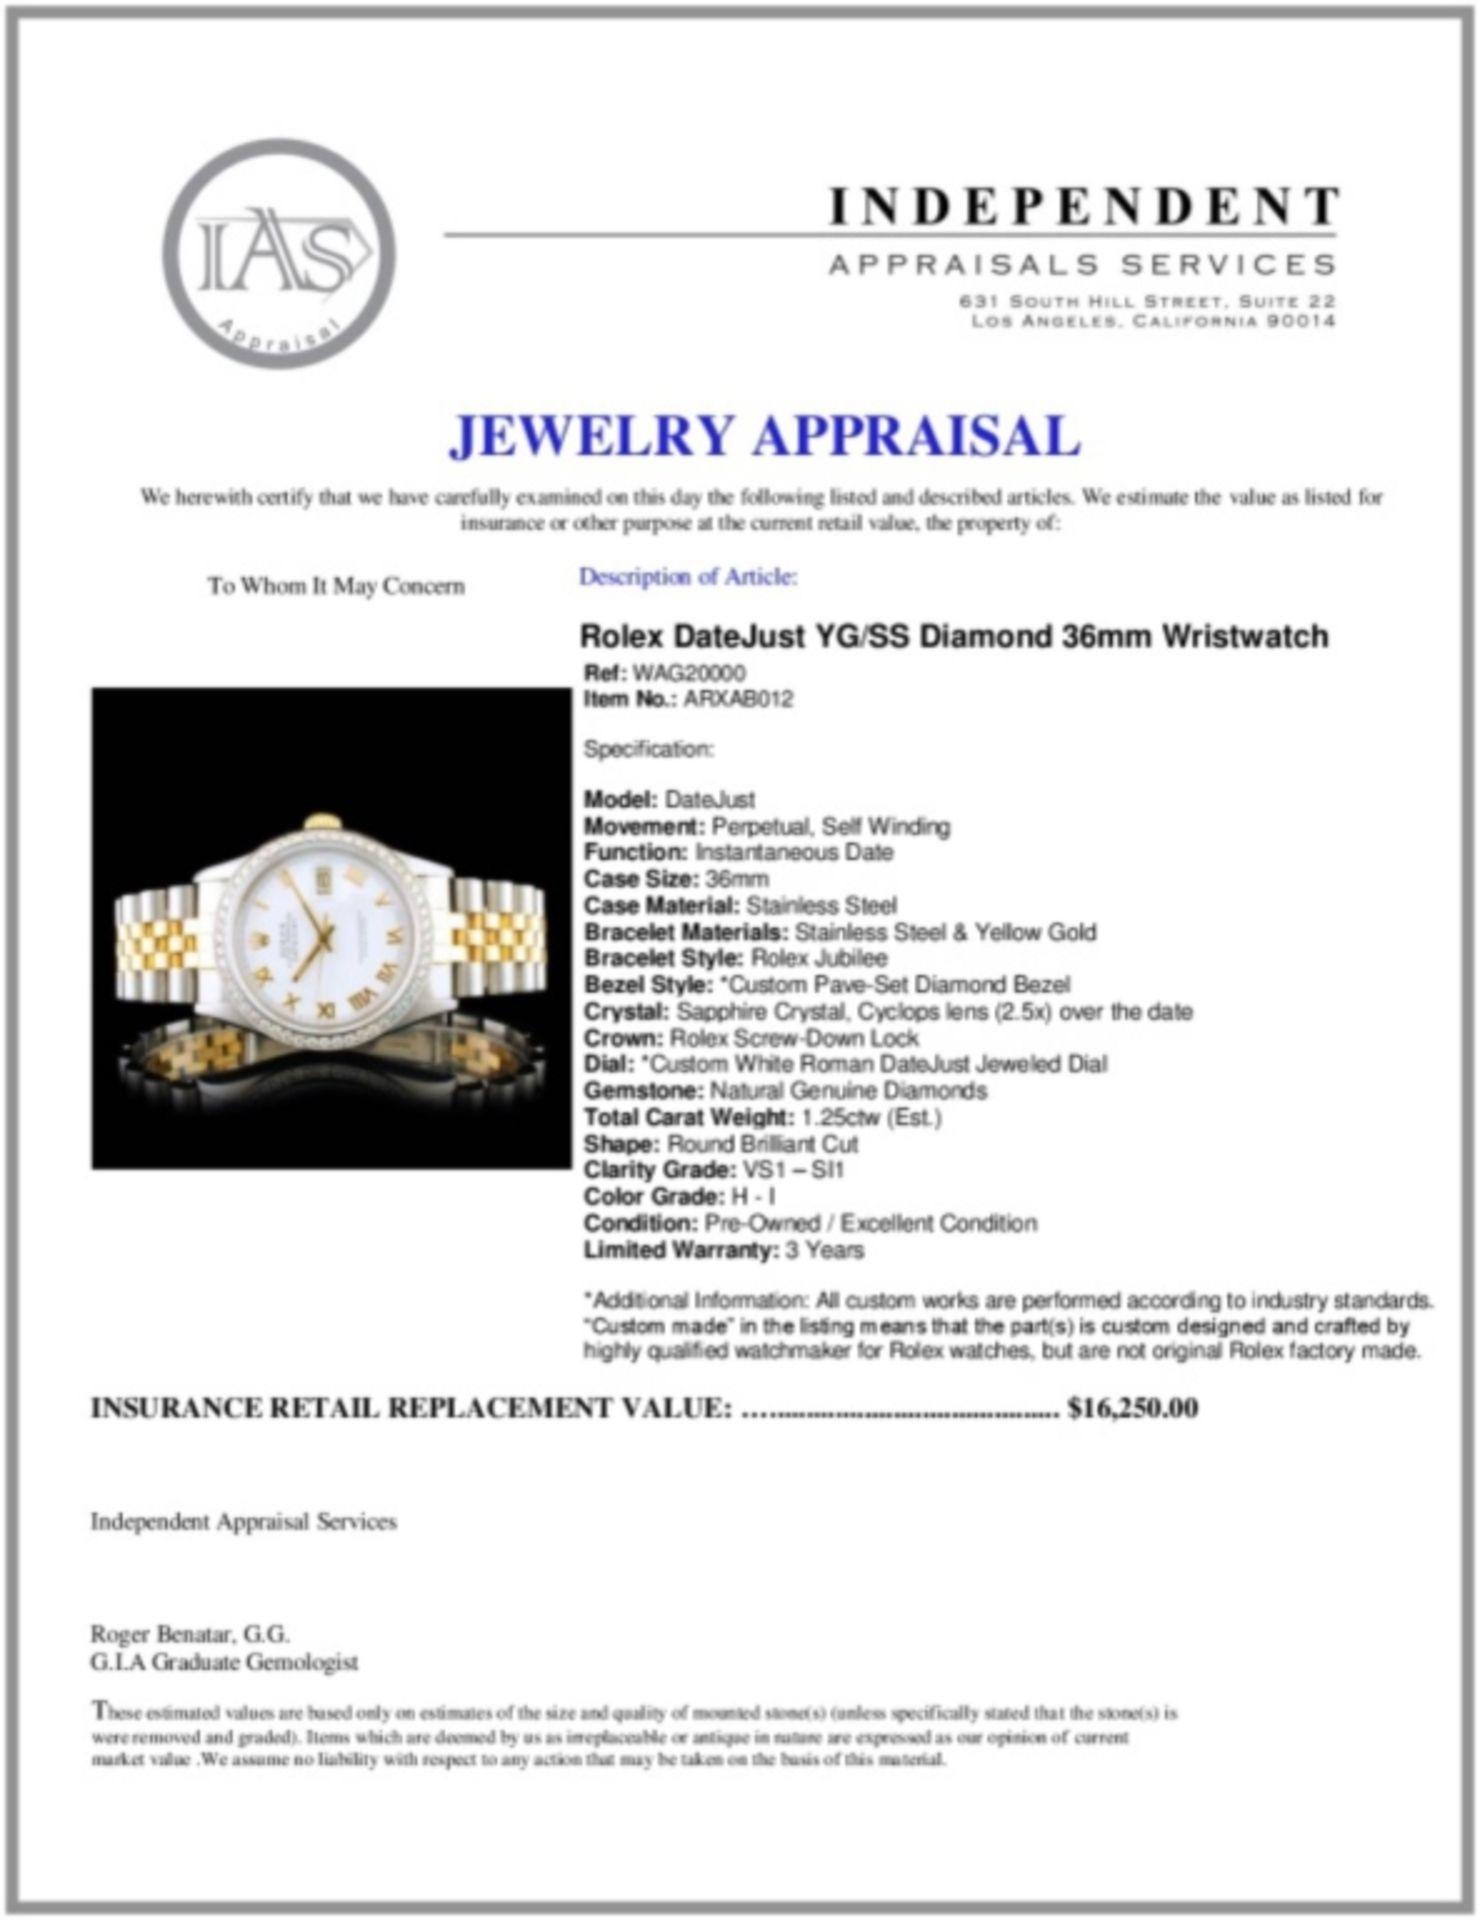 Rolex DateJust YG/SS Diamond 36mm Wristwatch - Image 6 of 6